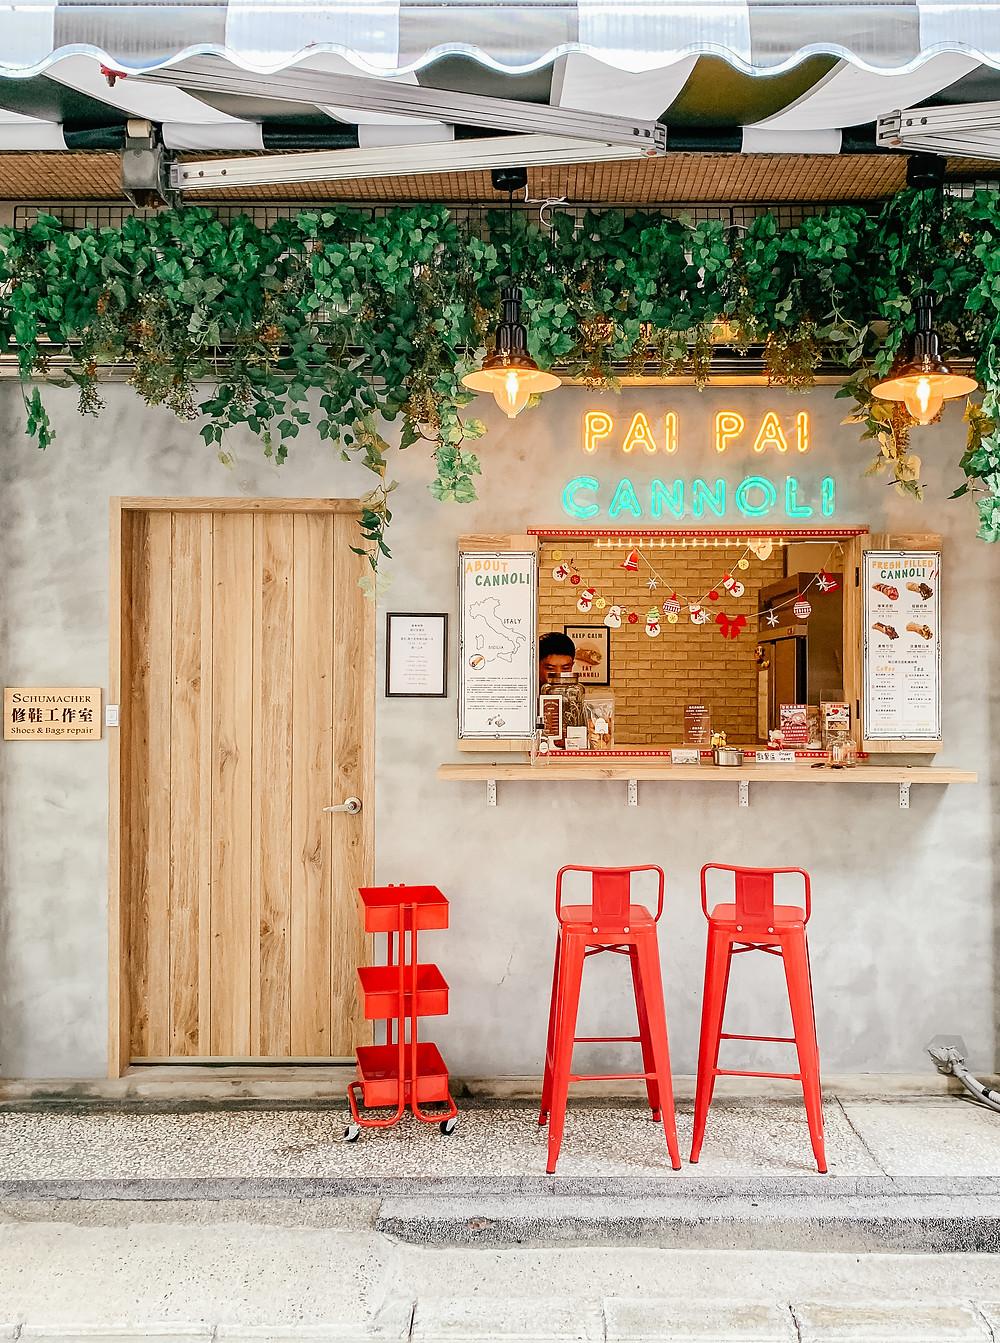 Pai Pai Cannoli | Taipei Pastry Shop | A Style Alike